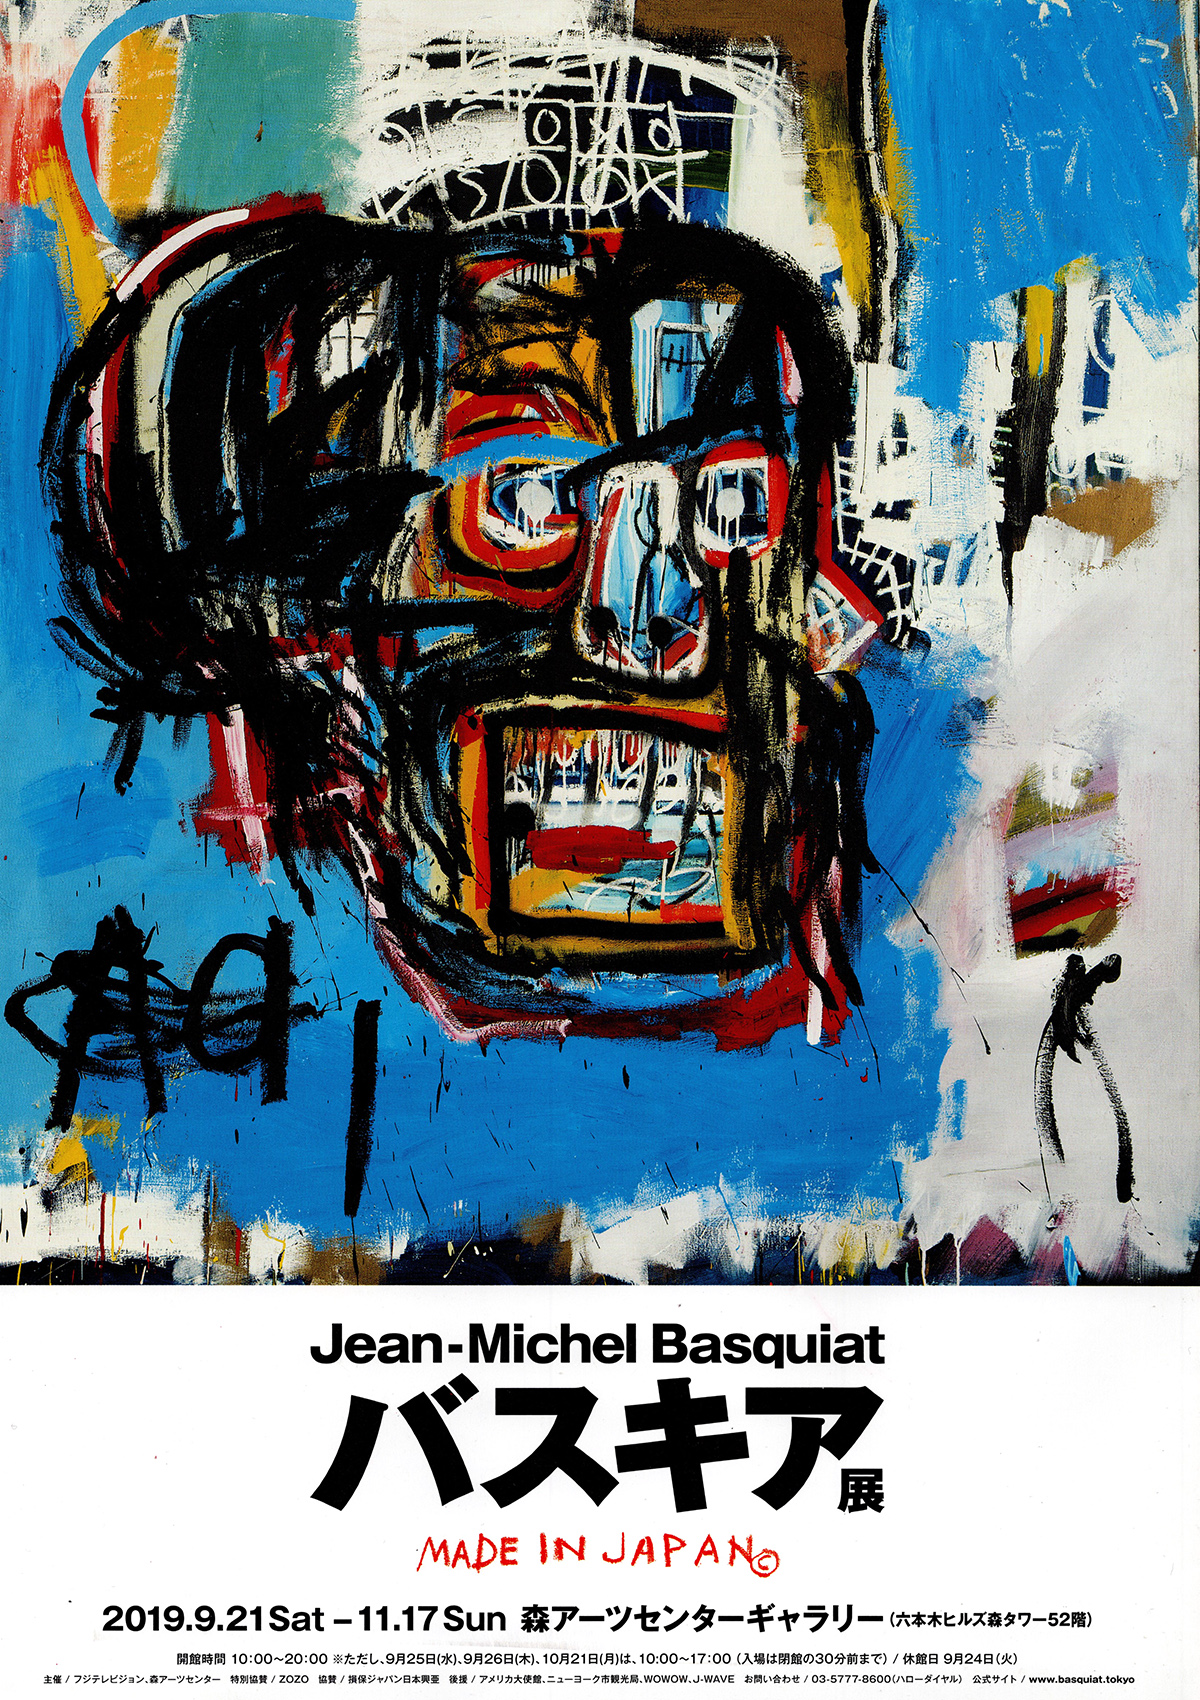 191113_basquiat1.jpg